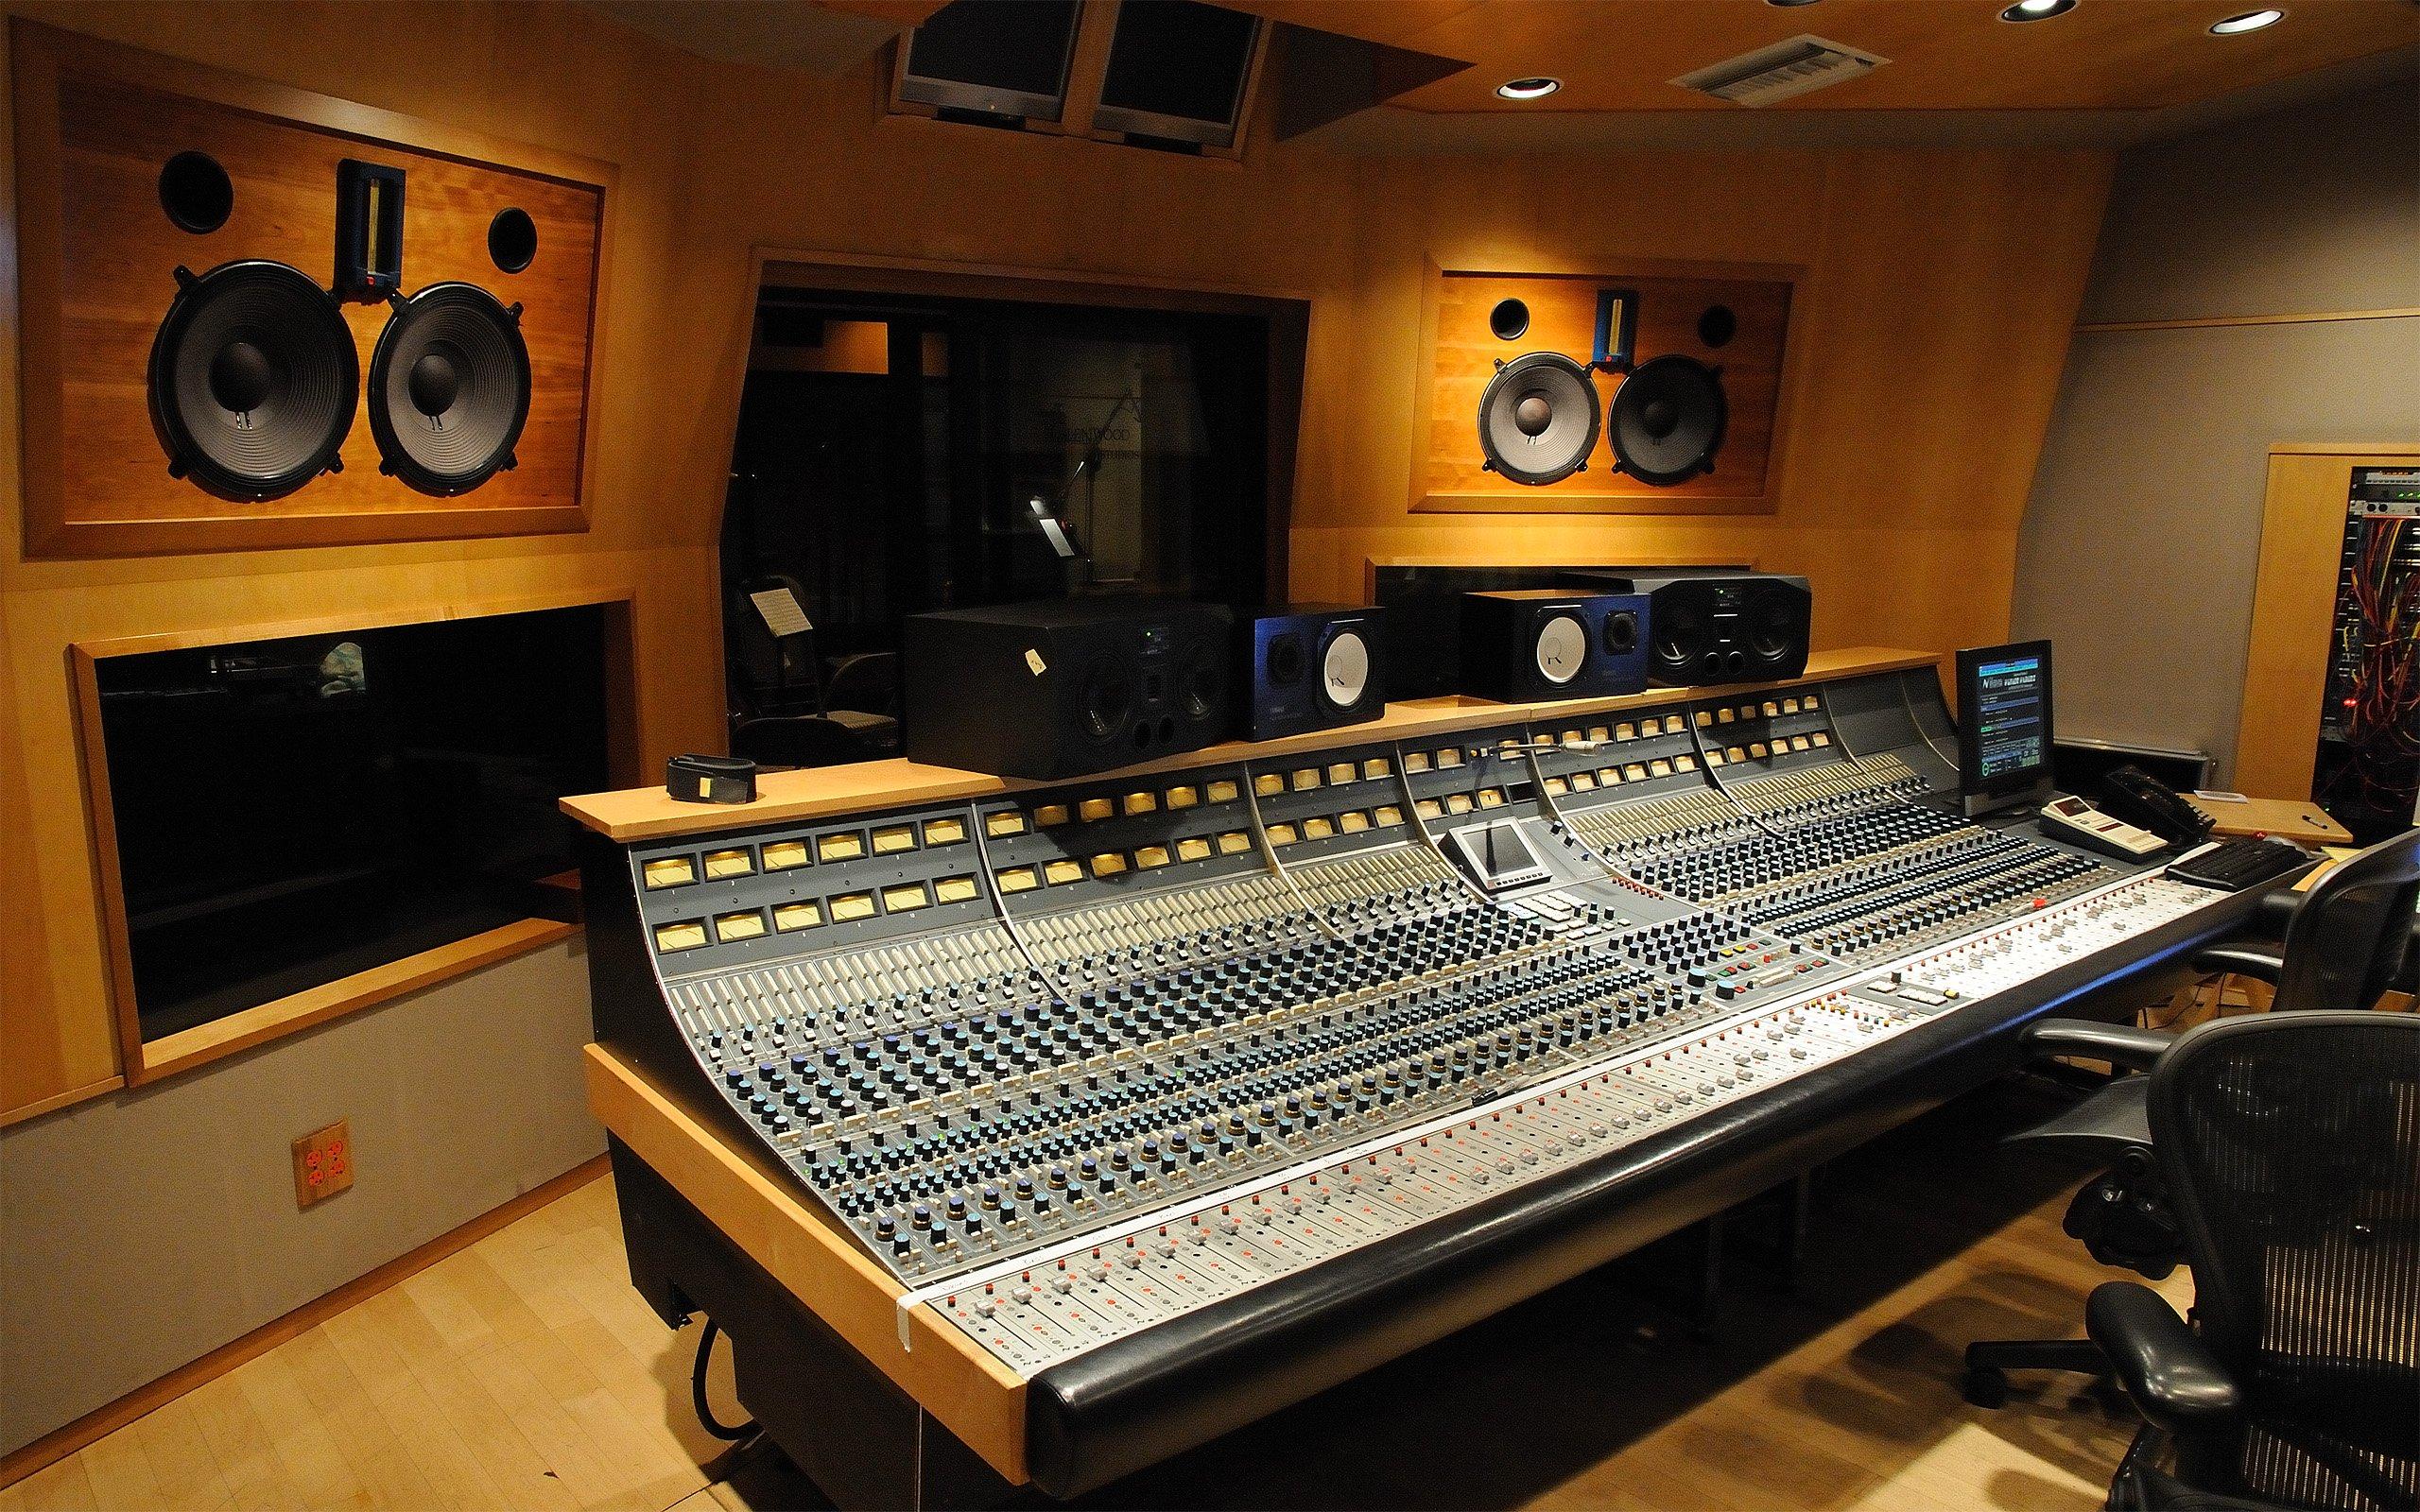 Studio recording wallpaper 2560x1600 333381 wallpaperup - Music recording studio wallpaper ...